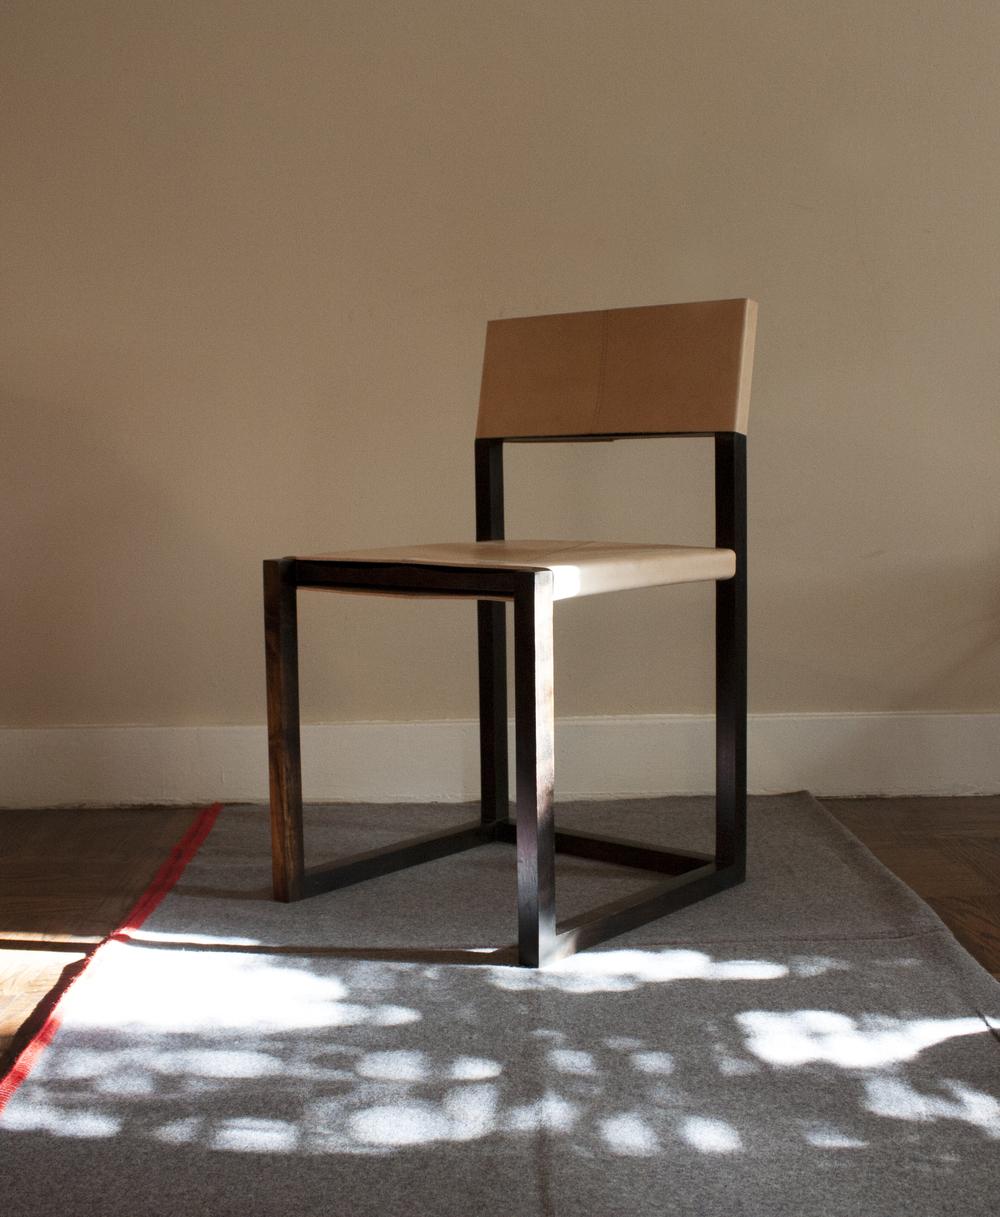 Studio Cidra: Hawthorne Chair